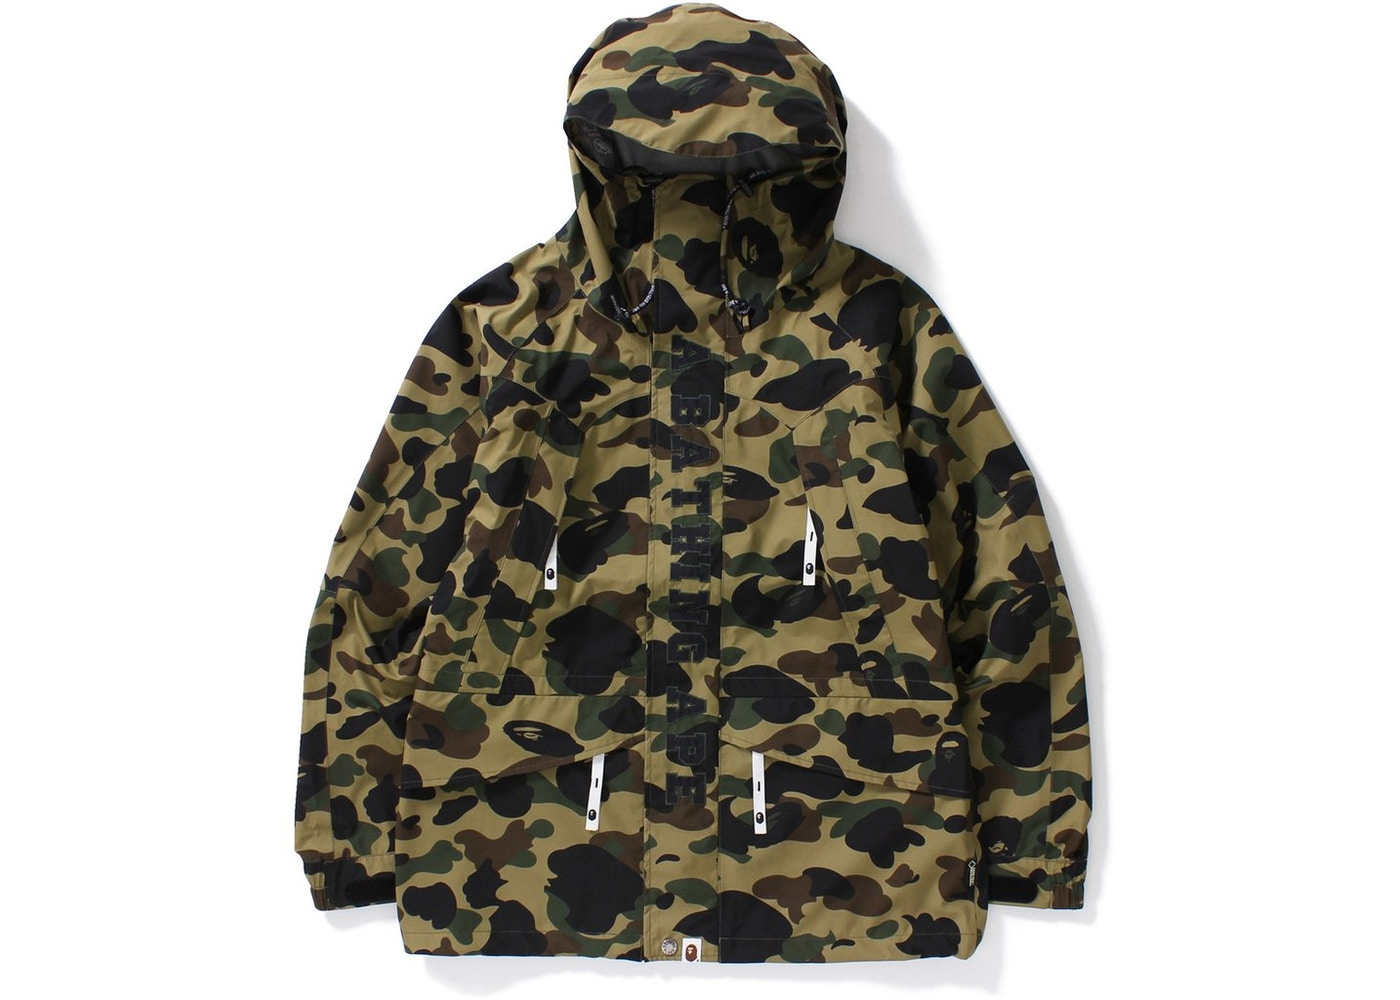 ce279491224c3 BAPE Gore-Tex 1st Camo Snowboard Jacket Jacket Green -